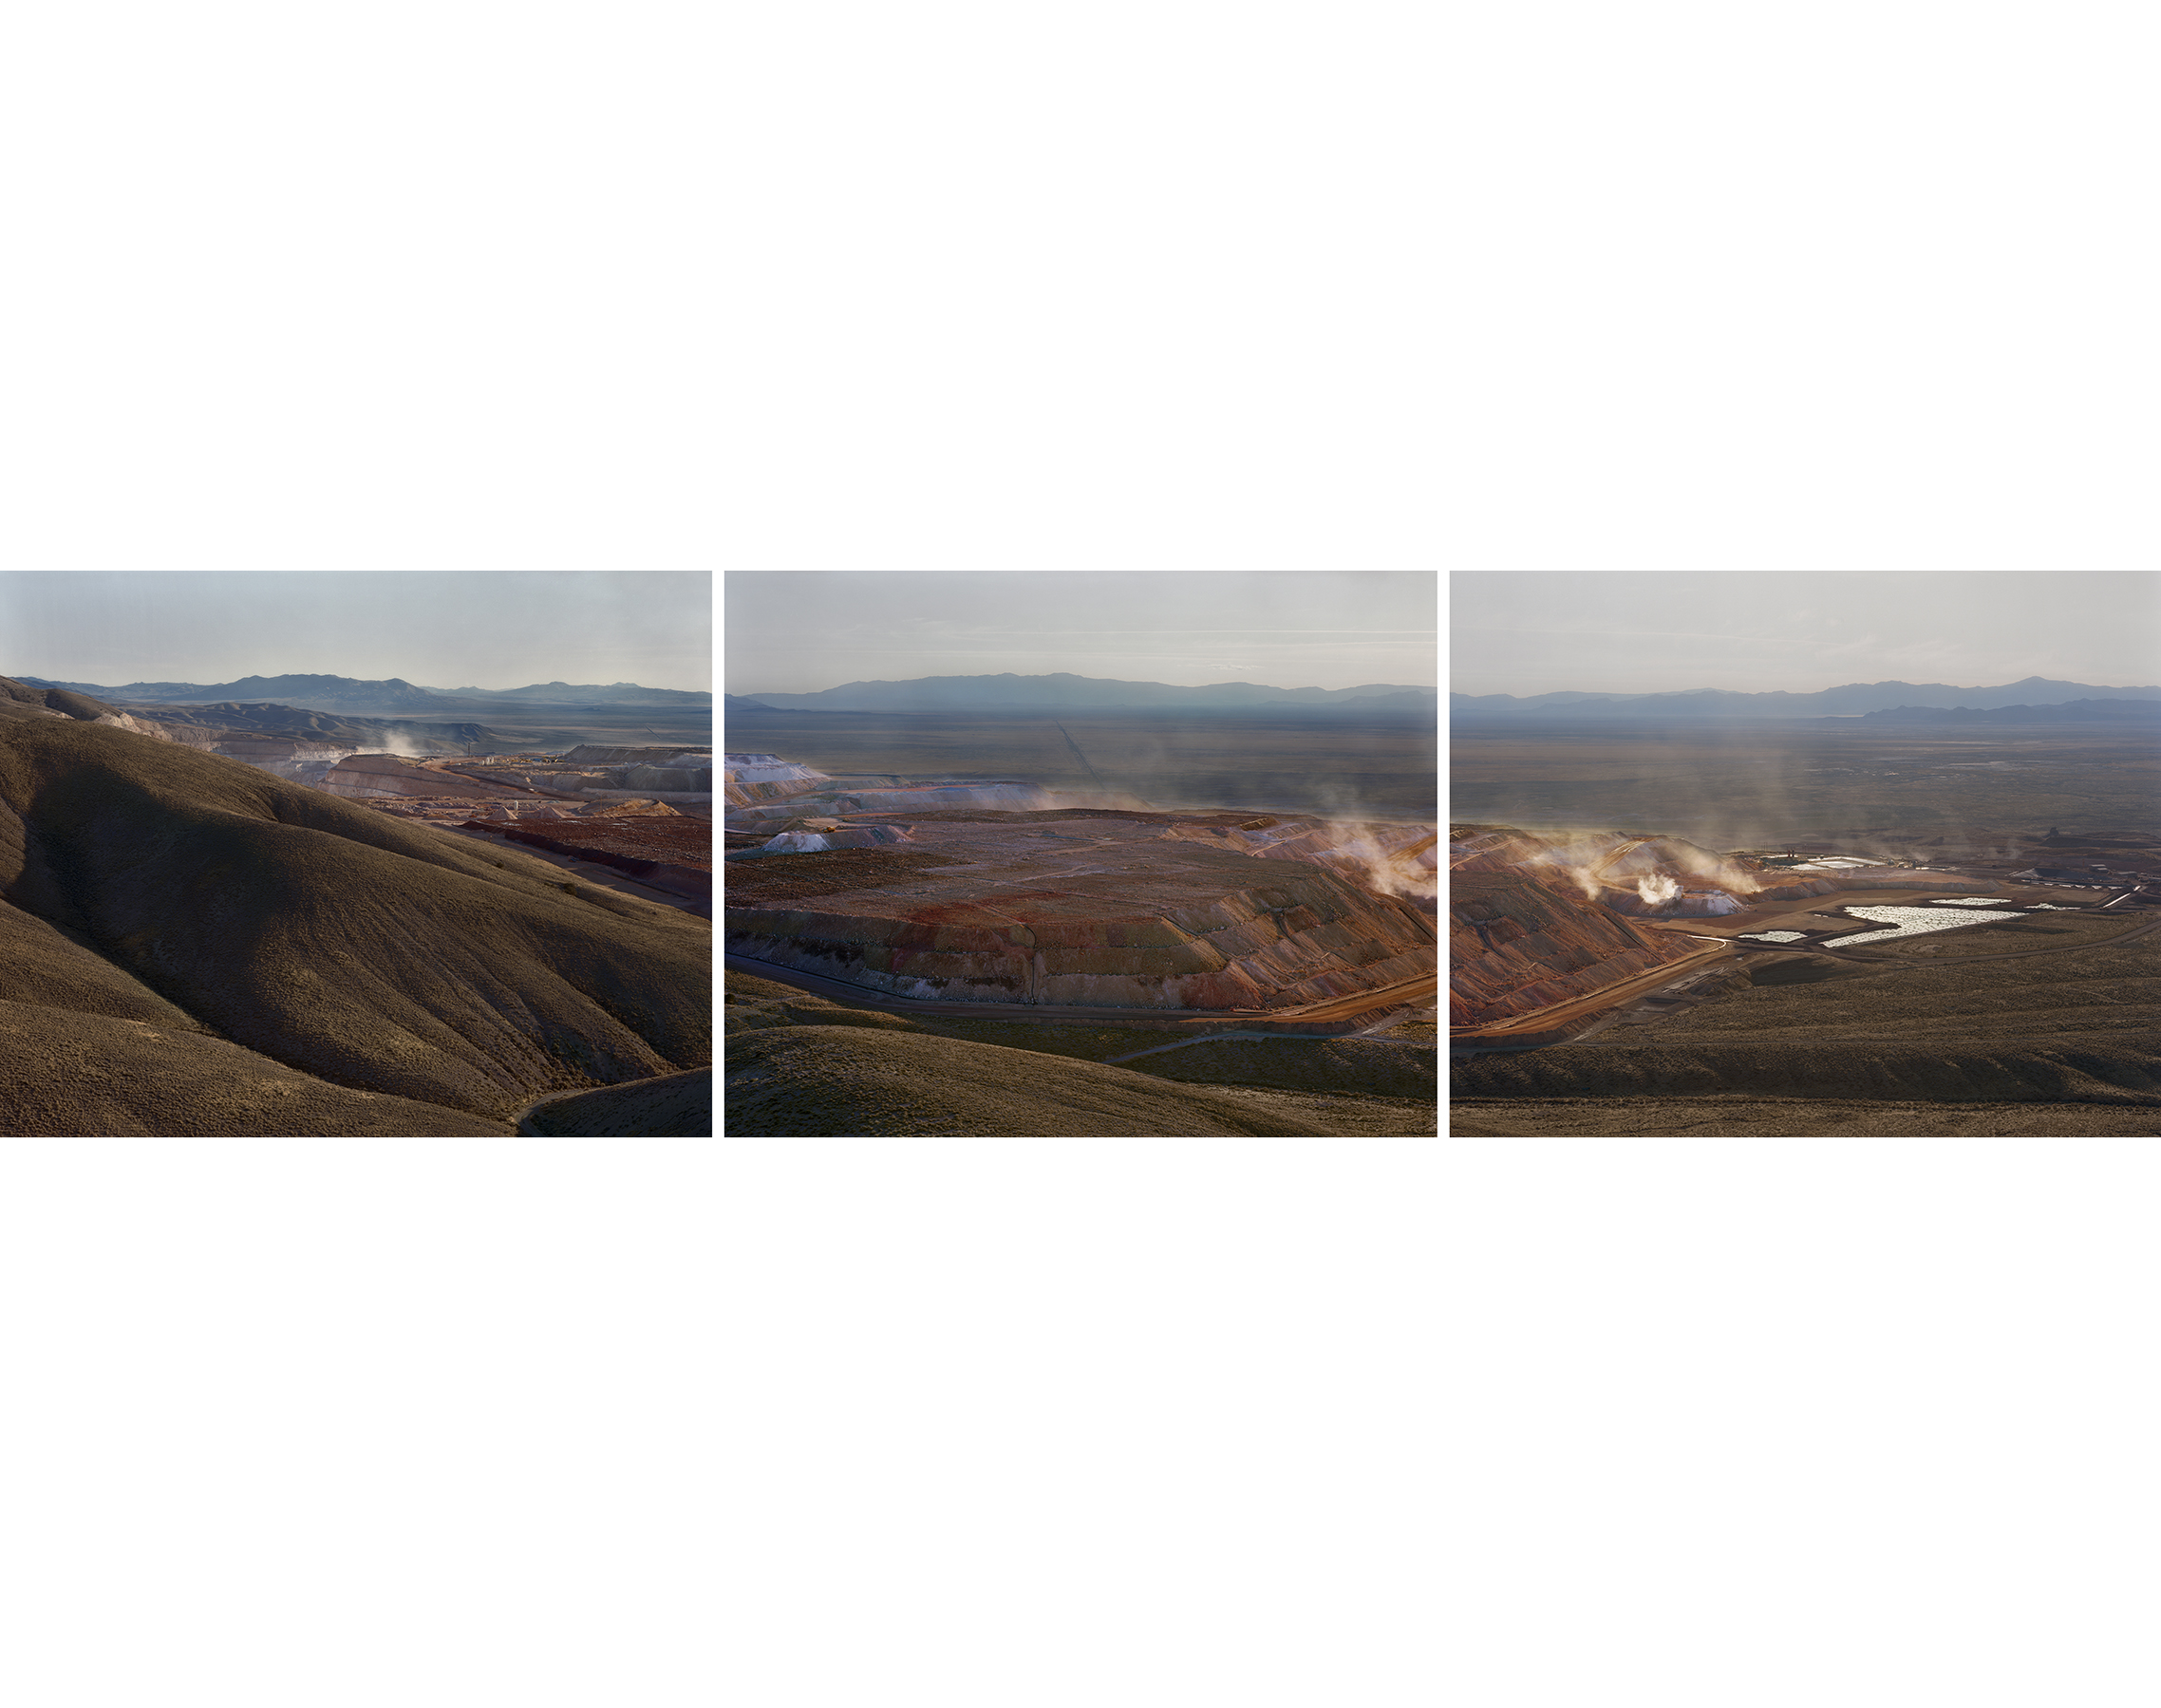 Hycroft Gold Mine, Black Rock Desert, Nevada, 2012.jpg